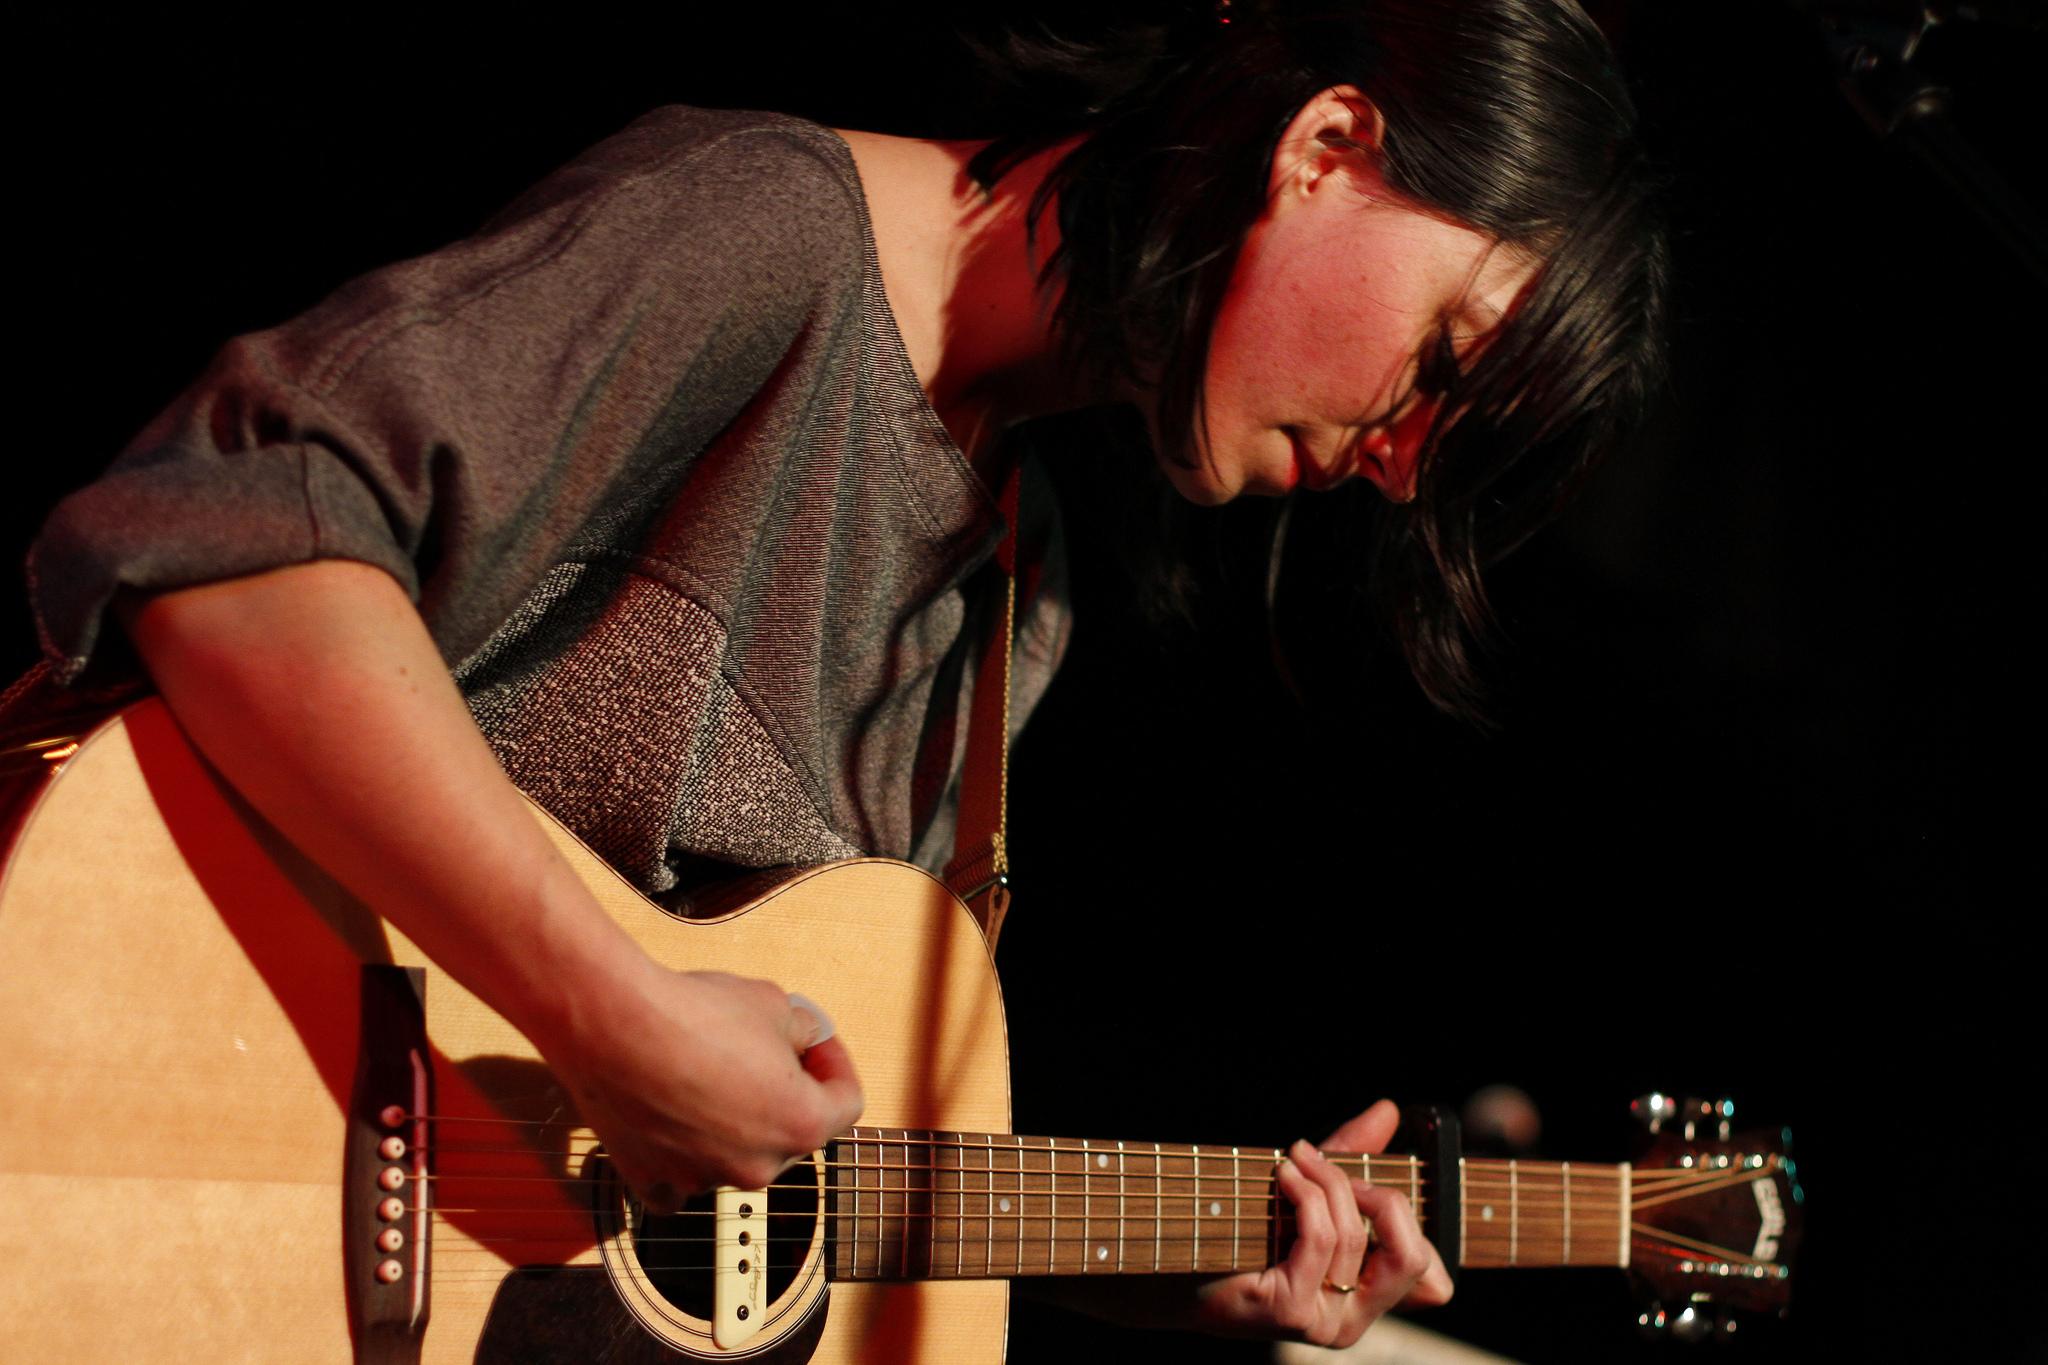 Sharon Van Etten performs Black Cat in Washington, DC on Feb. 11, 2012.